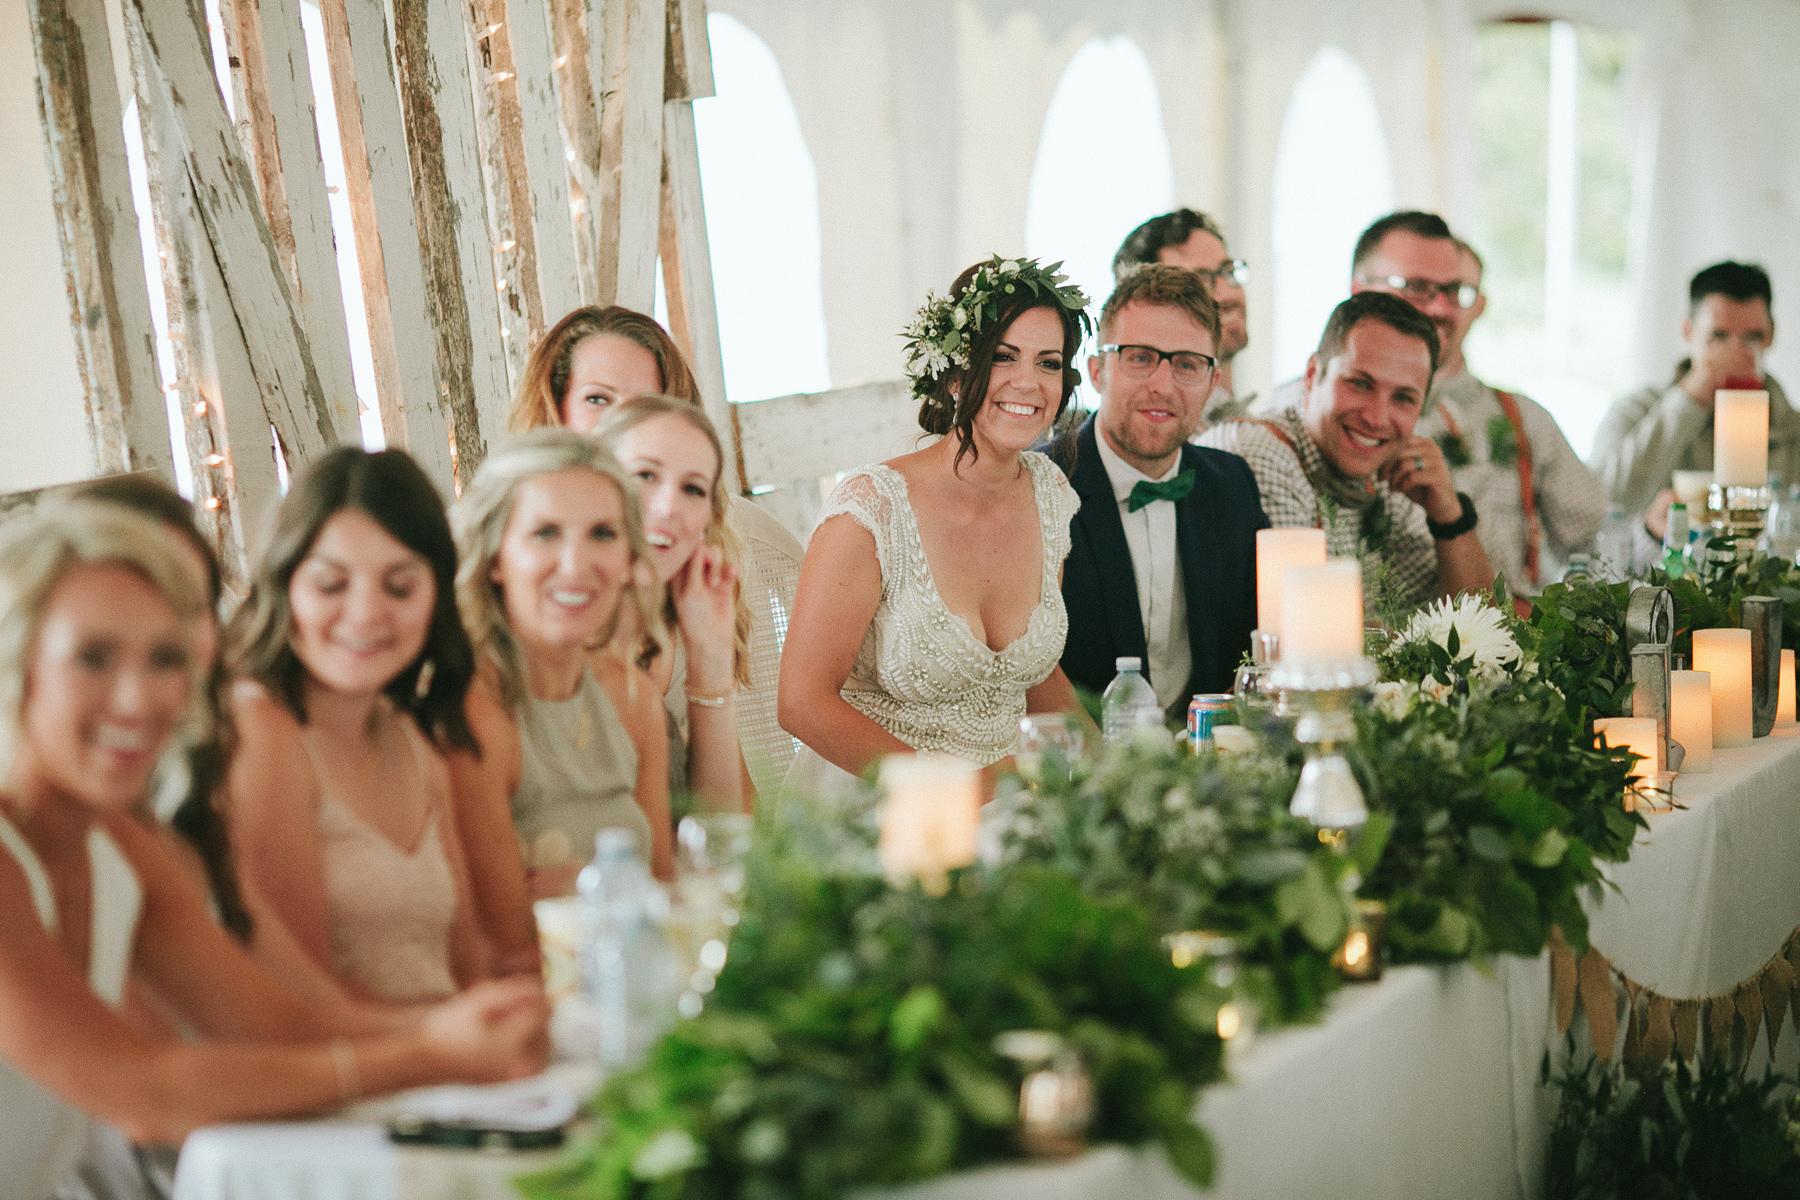 alberta-farm-wedding-photographer-rp-wj-206.jpg